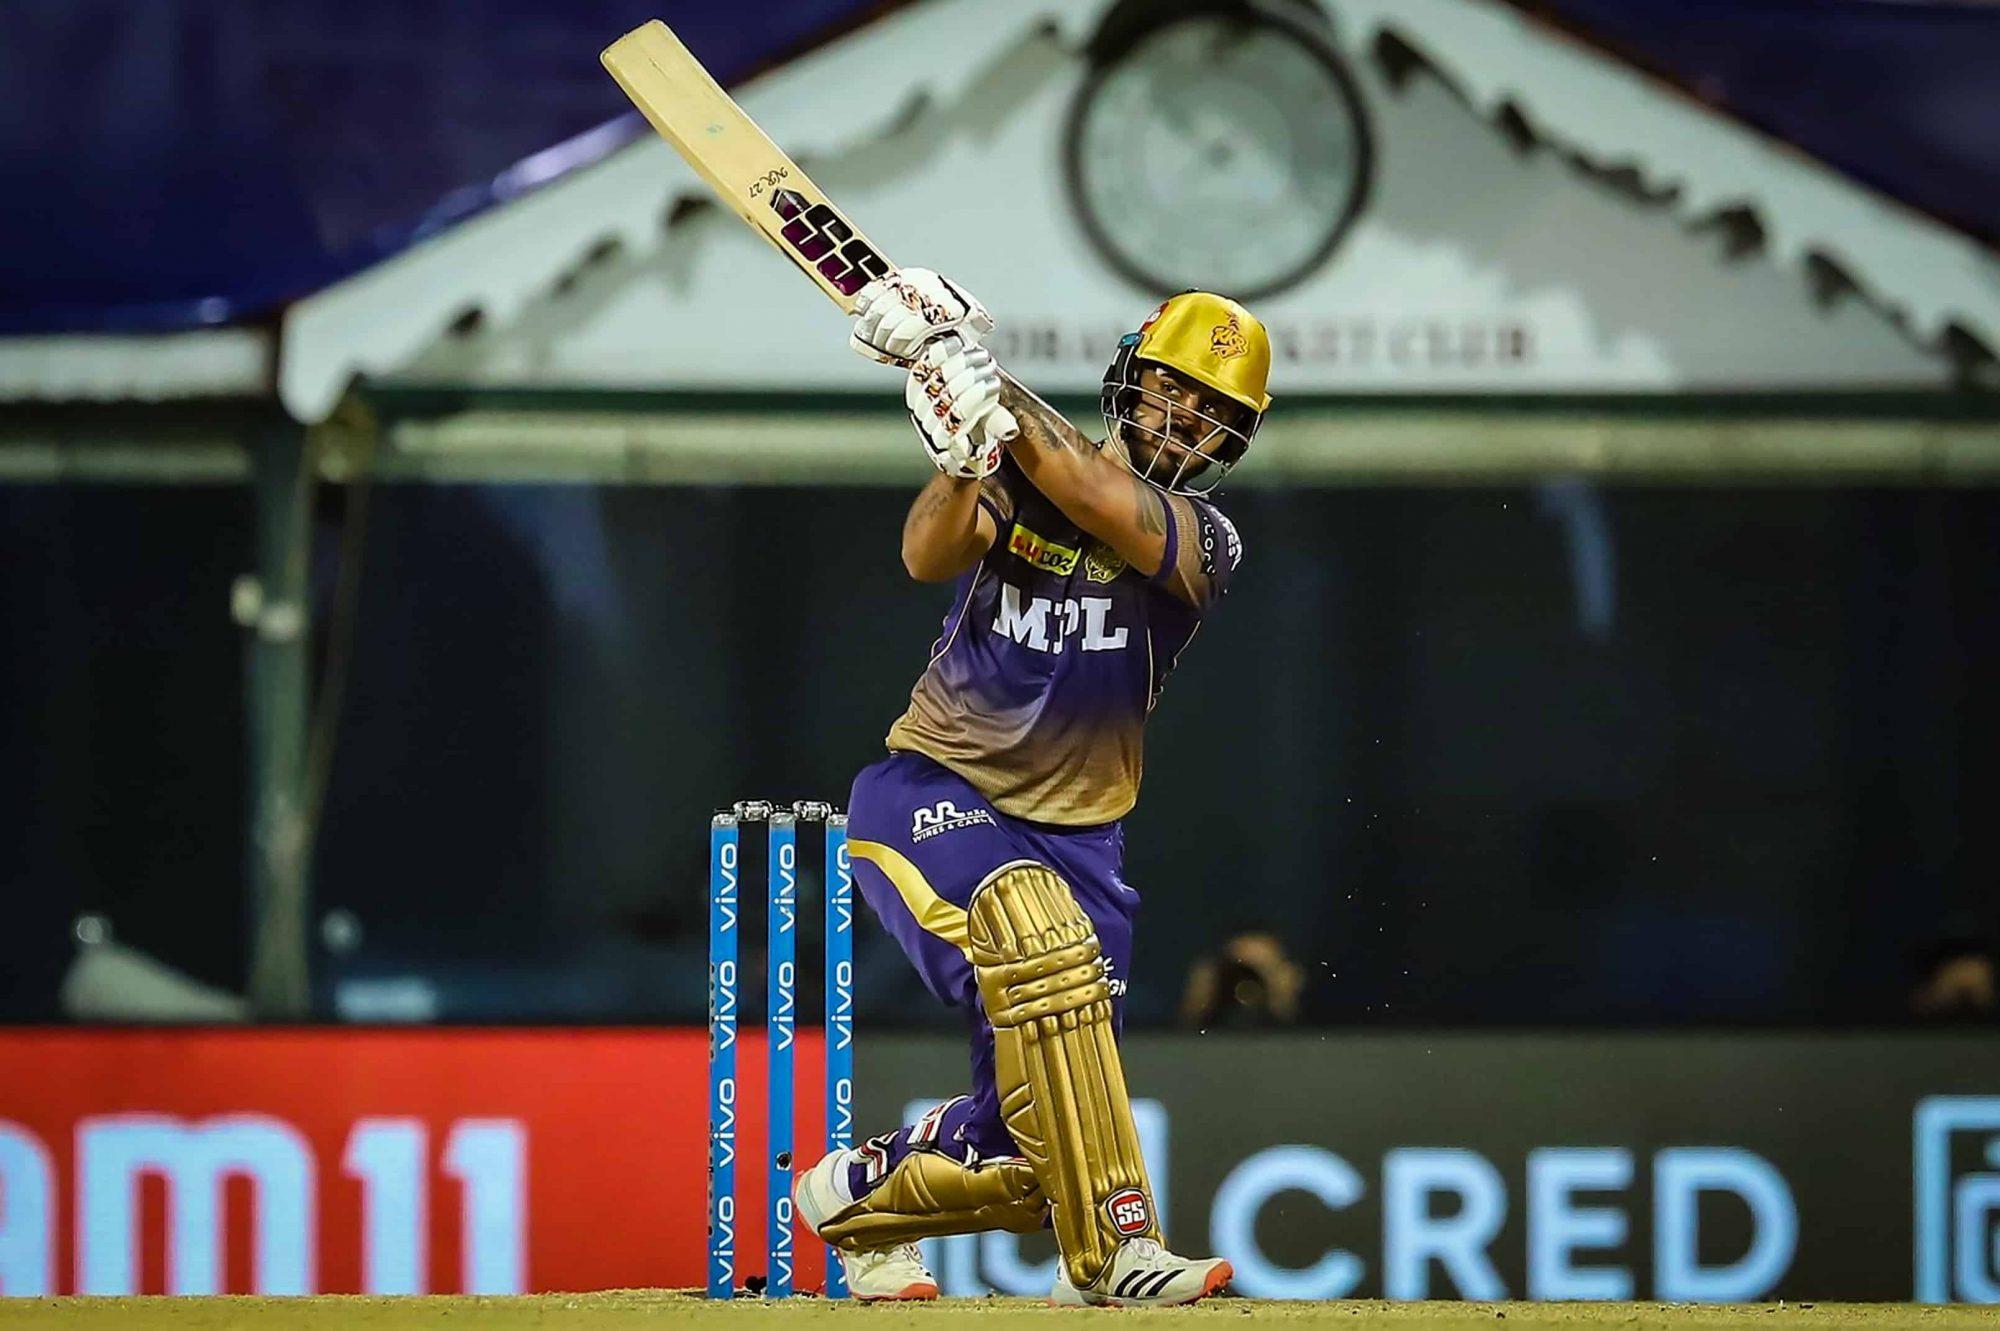 SRH vs KKR: Nitish Rana Slams His 12th IPL Fifty